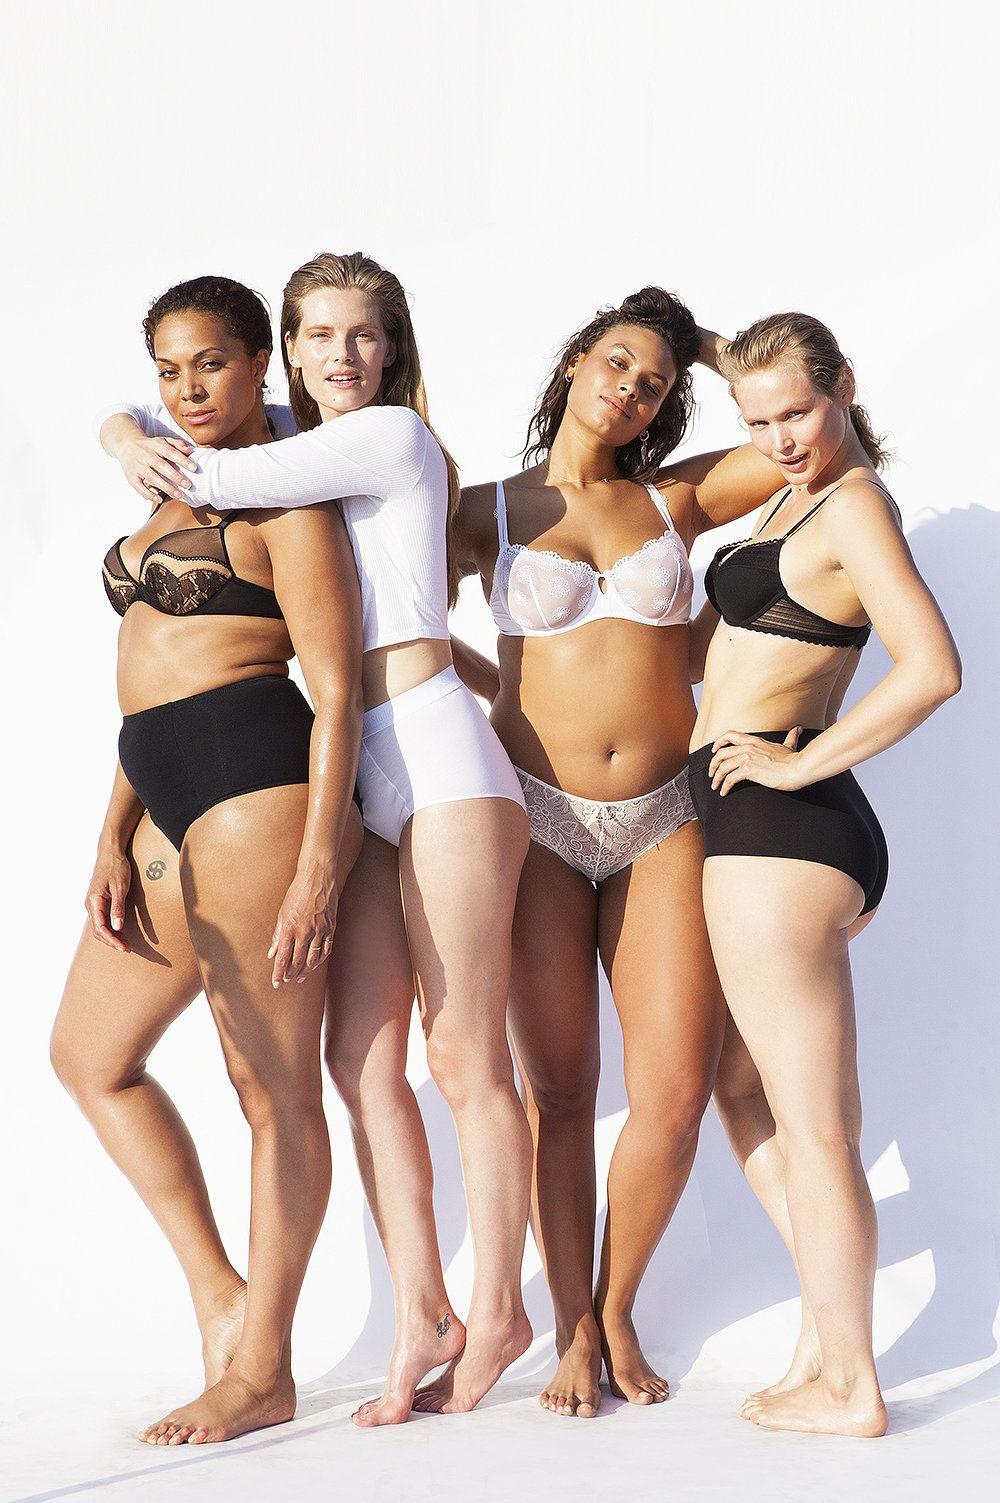 Hot fatty girls in vegas